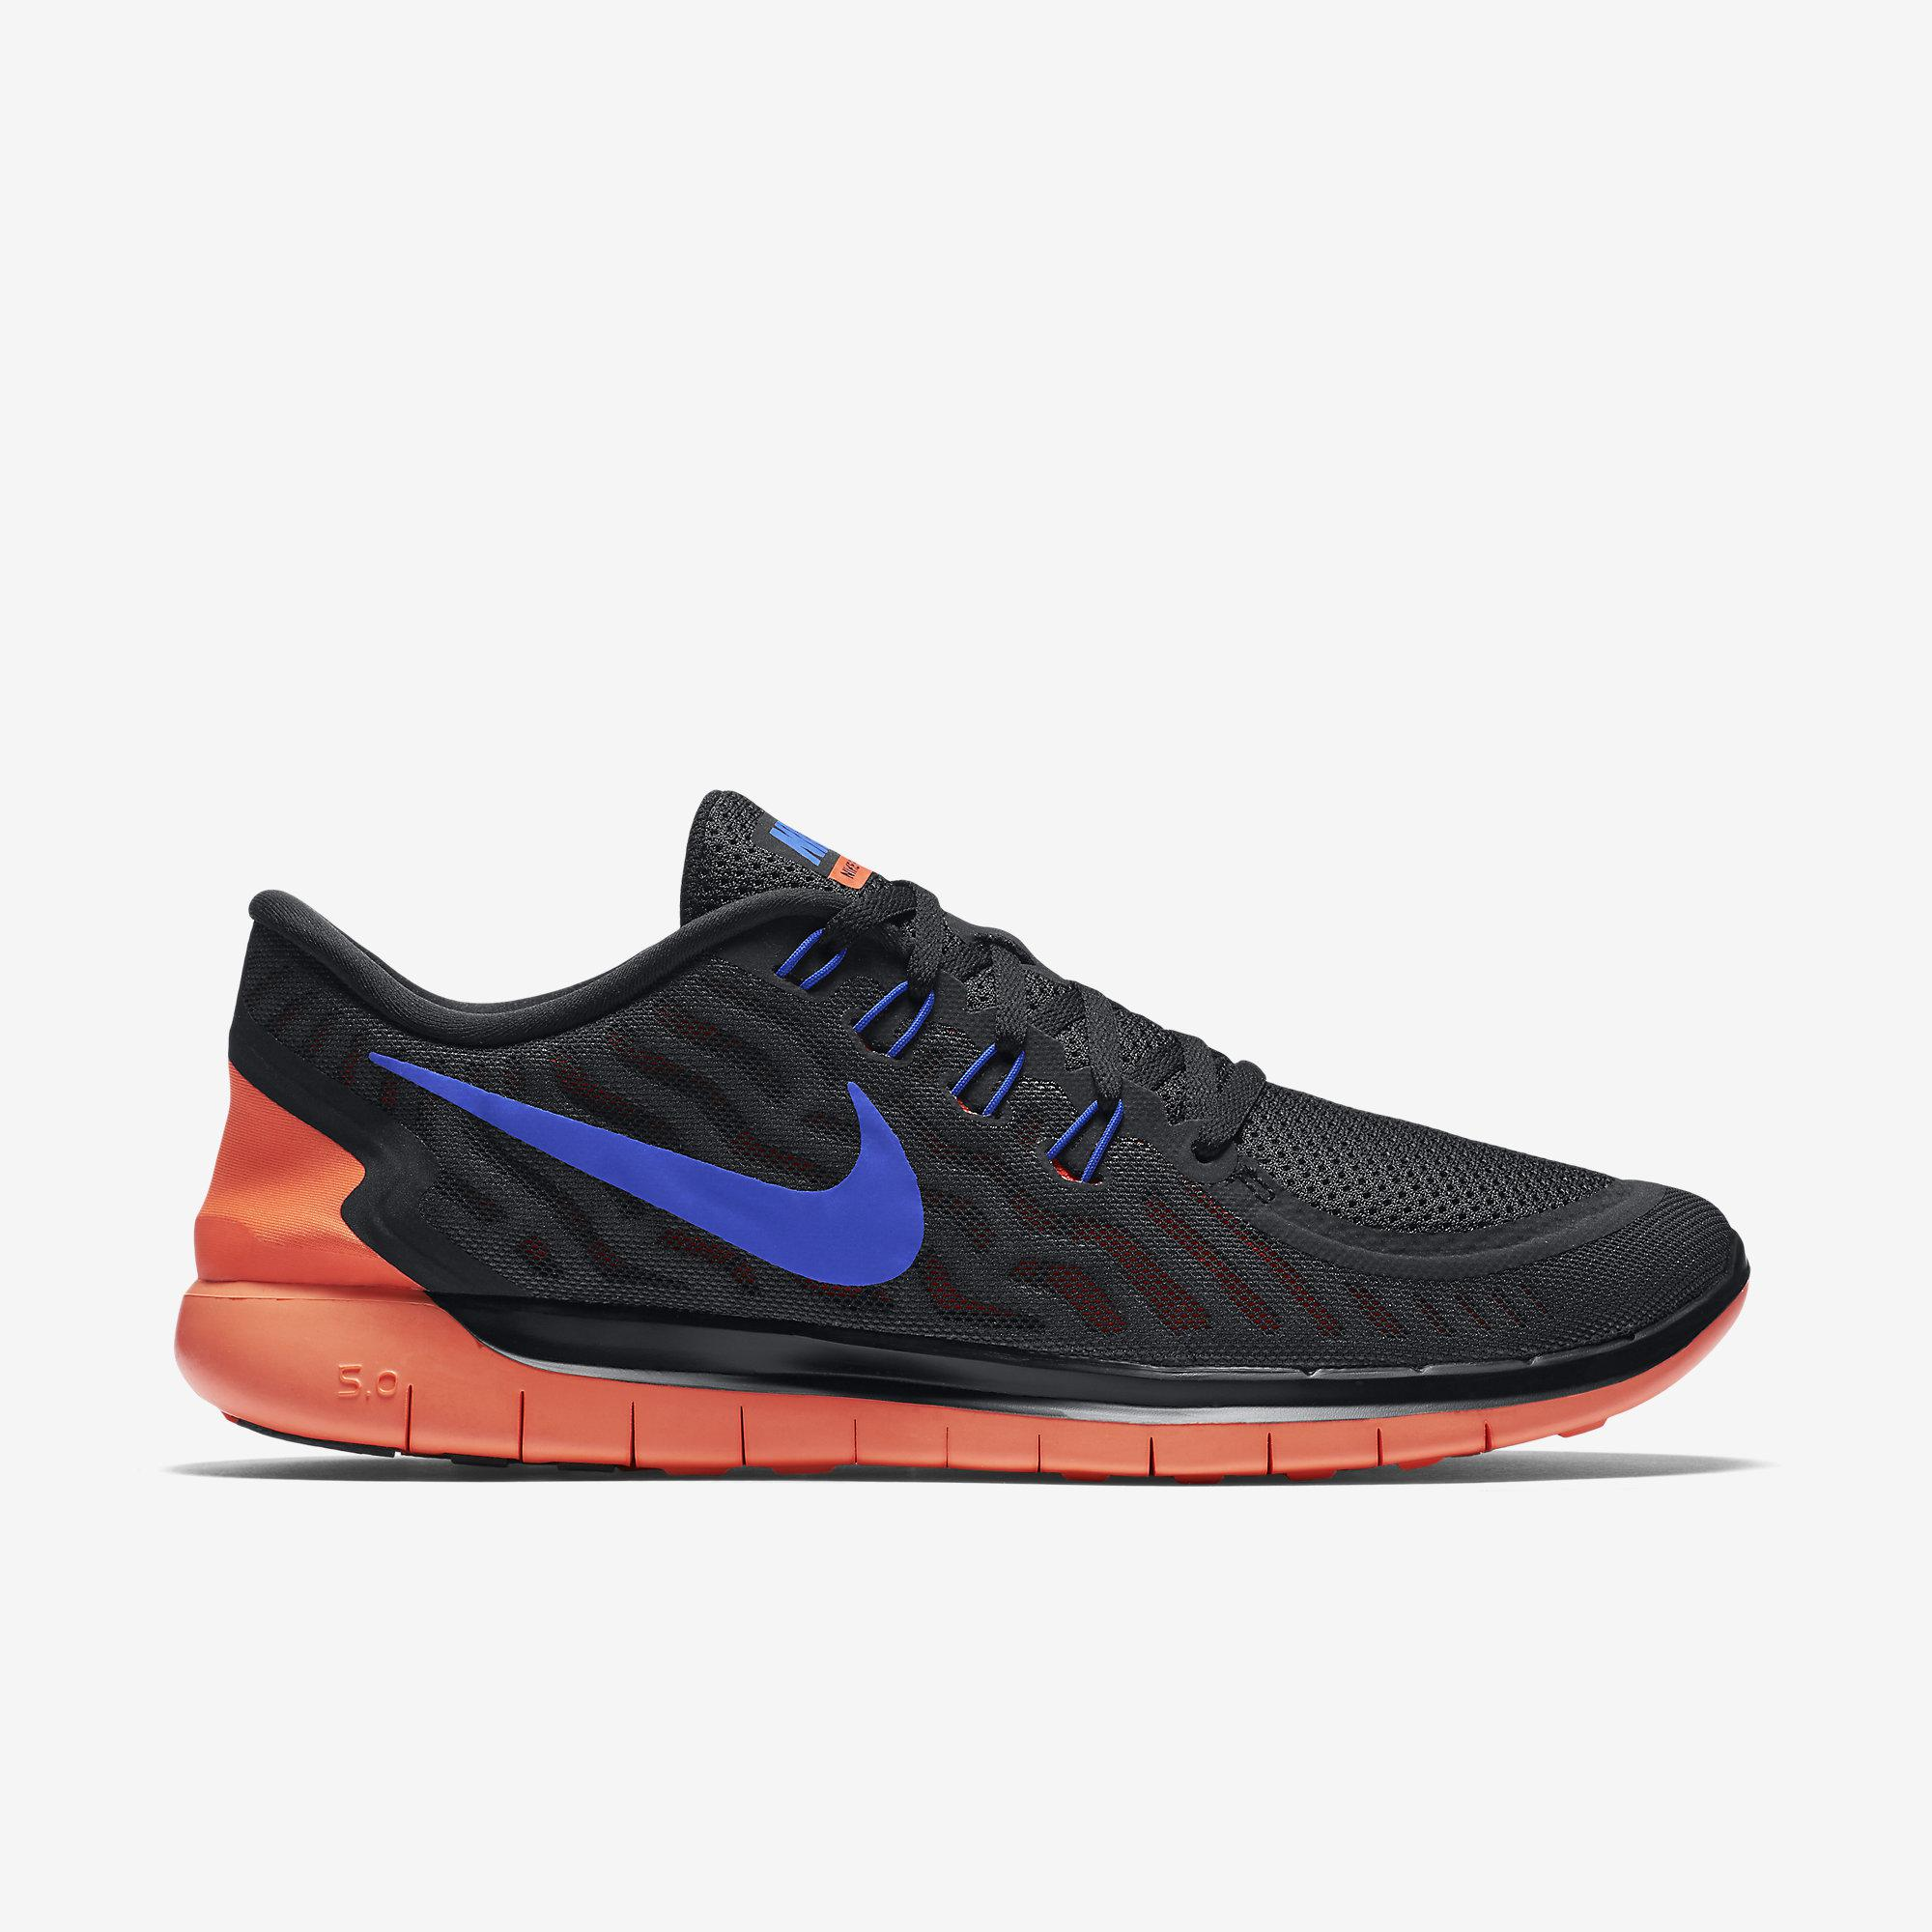 hot sale online 17790 65fbf Nike Mens Free 5.0 Running Shoes - Black Blue Crimson - Tennisnuts.com